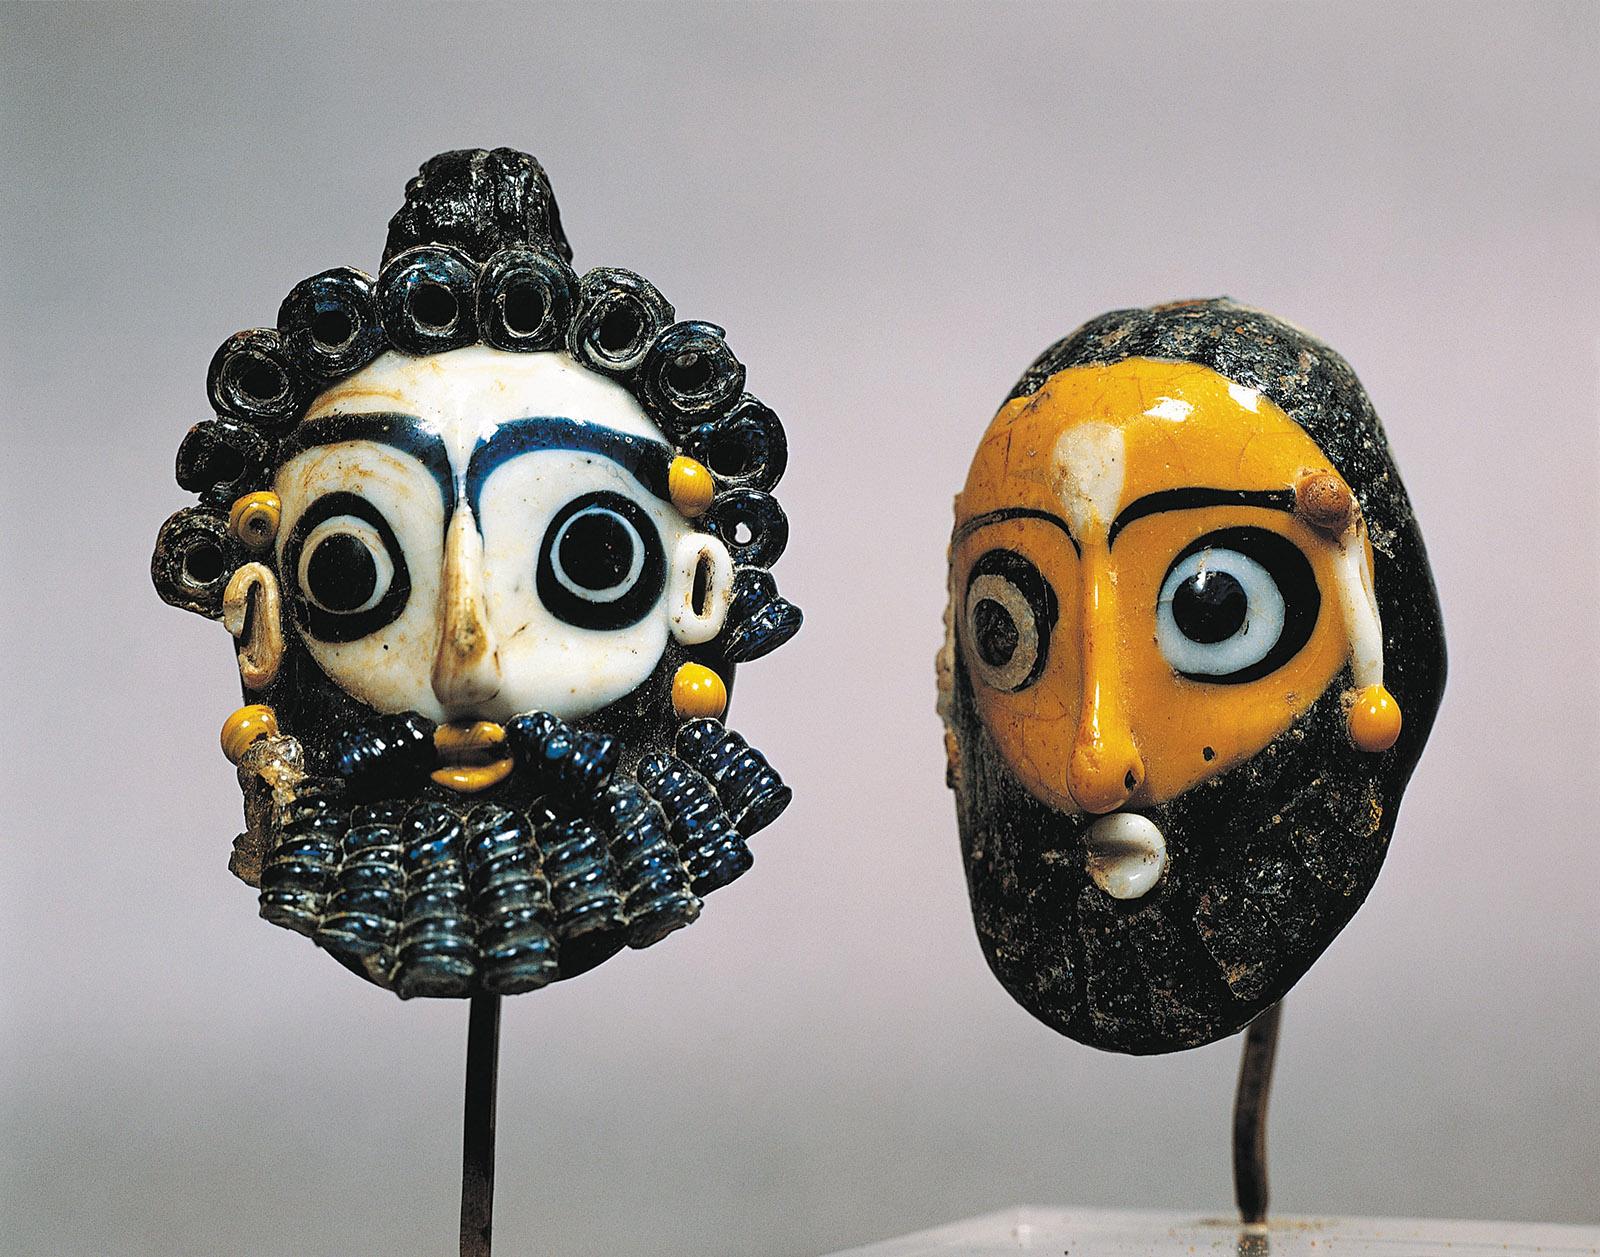 Phoenician glass masks from Carthage (modern-day Tunisia), third century BC